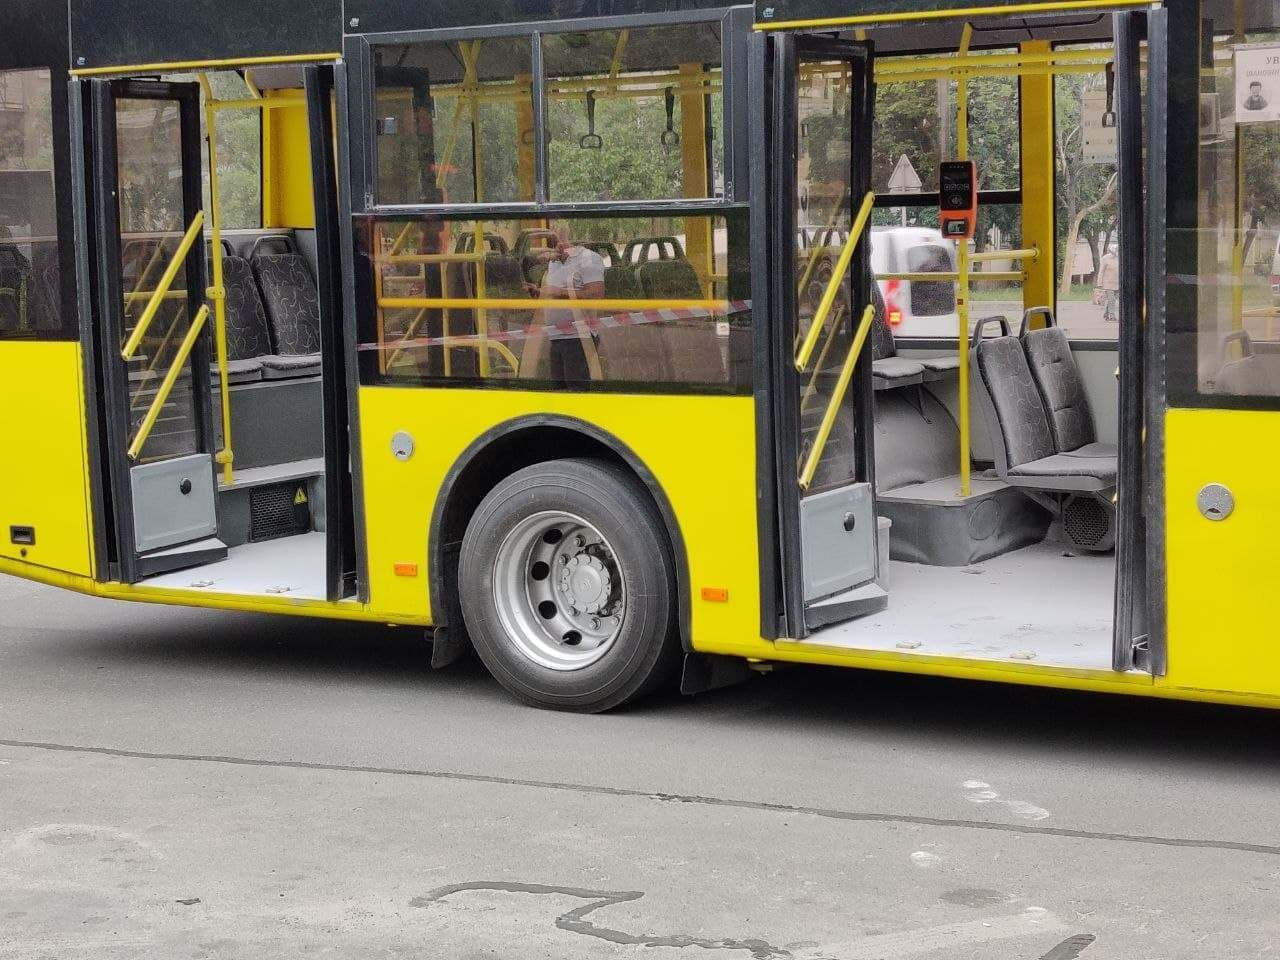 В салоне троллейбуса находились люди.